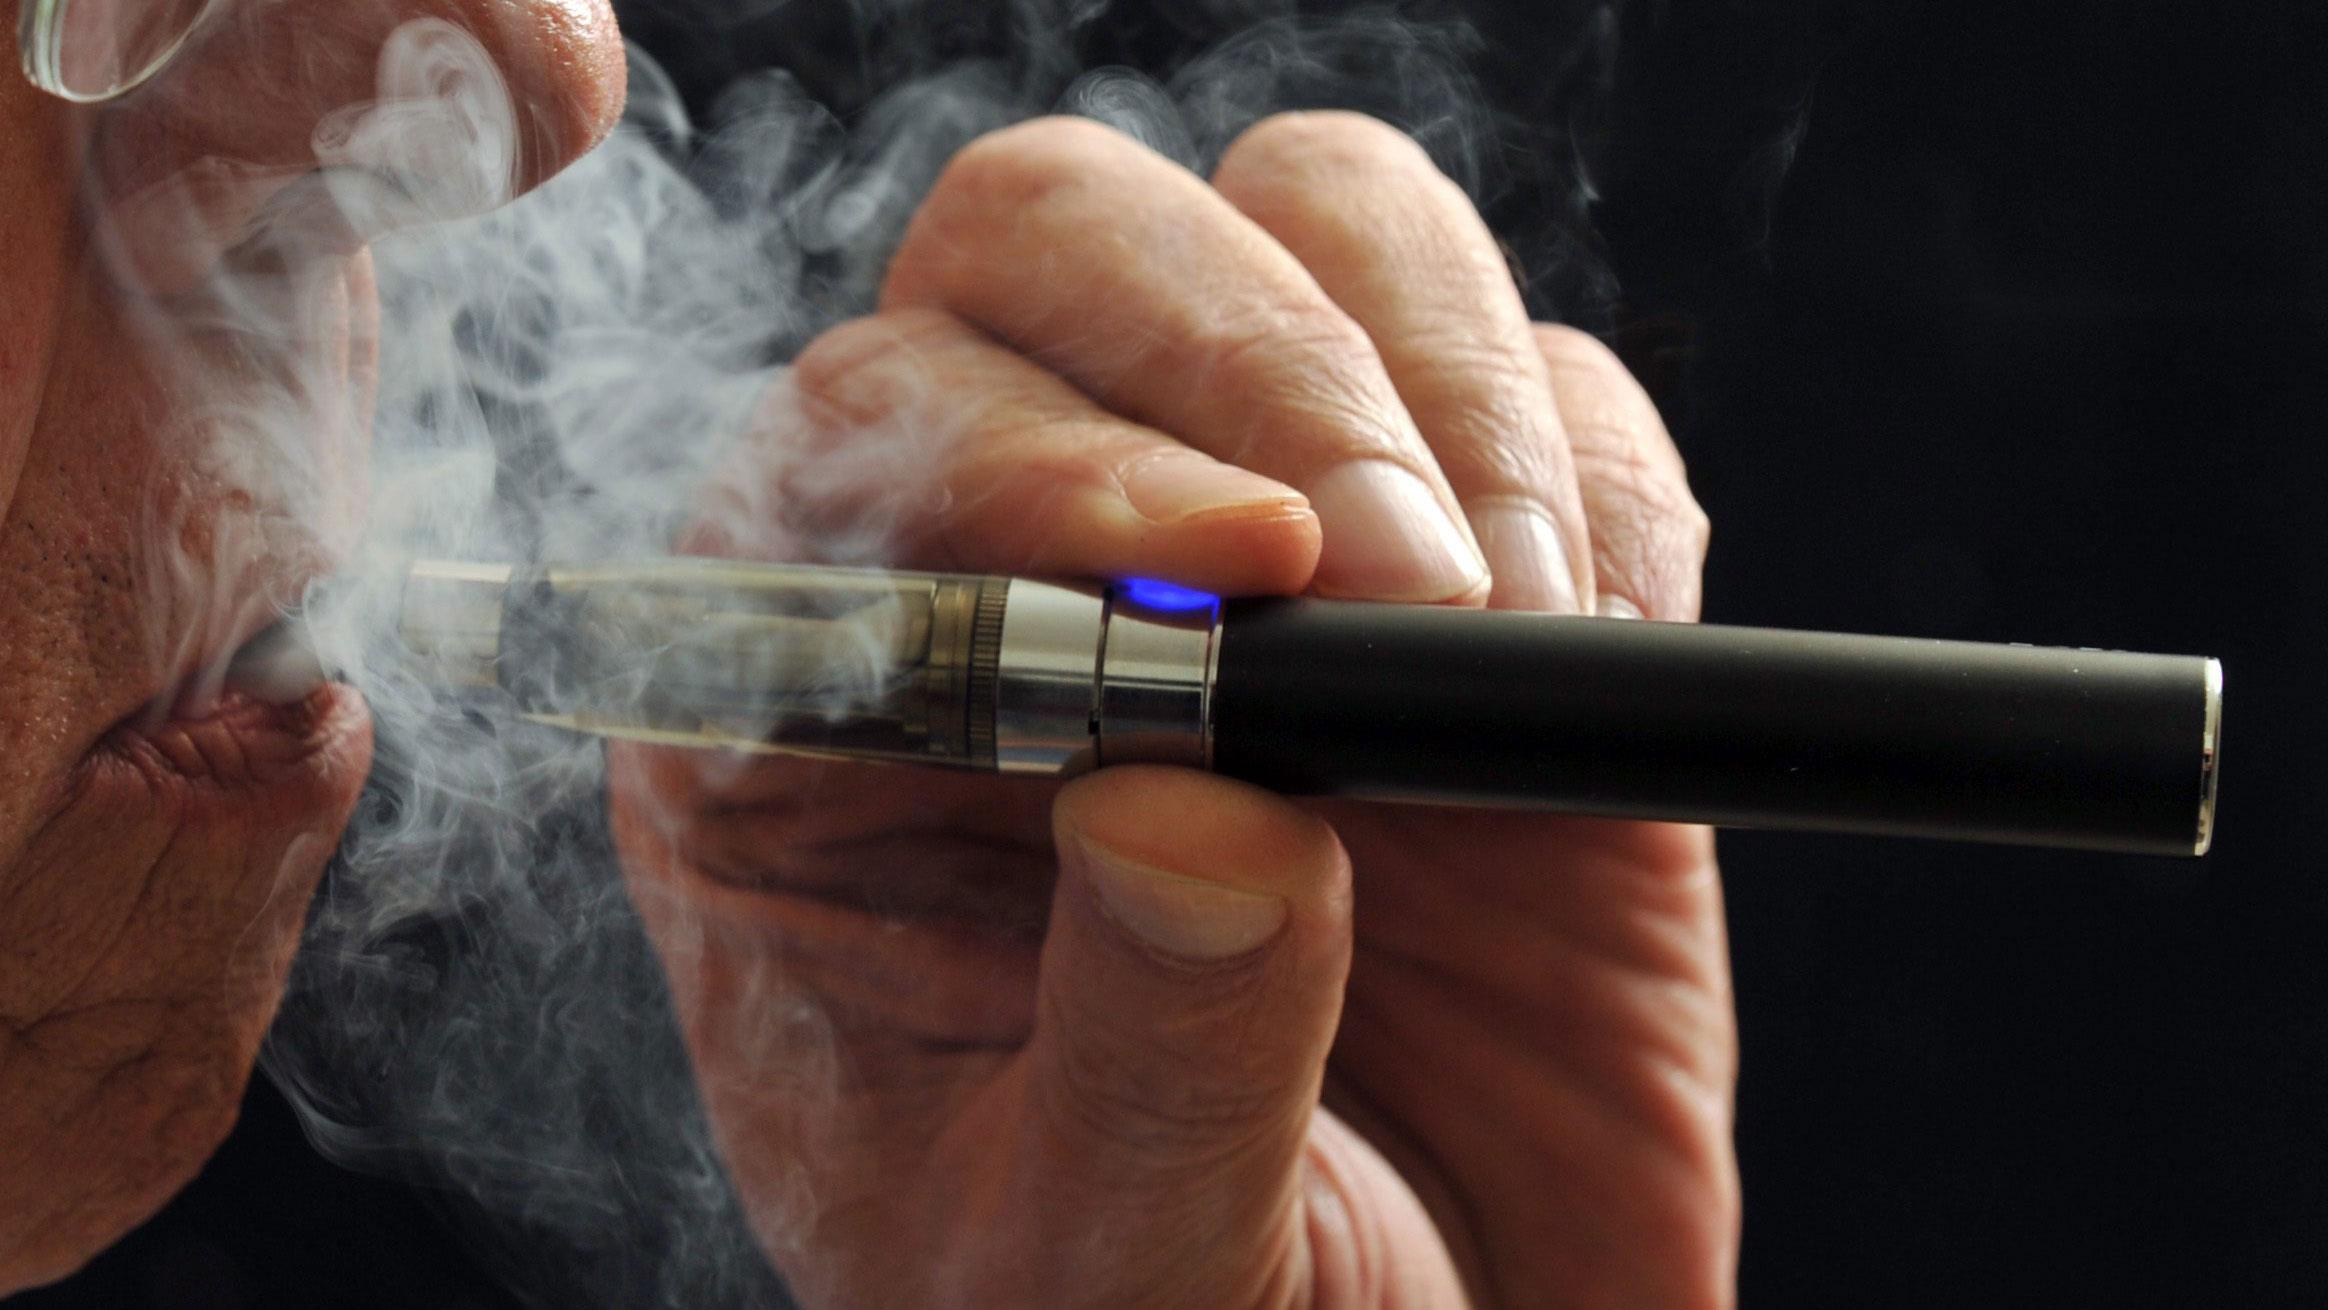 Buy 555 cigarettes a USA